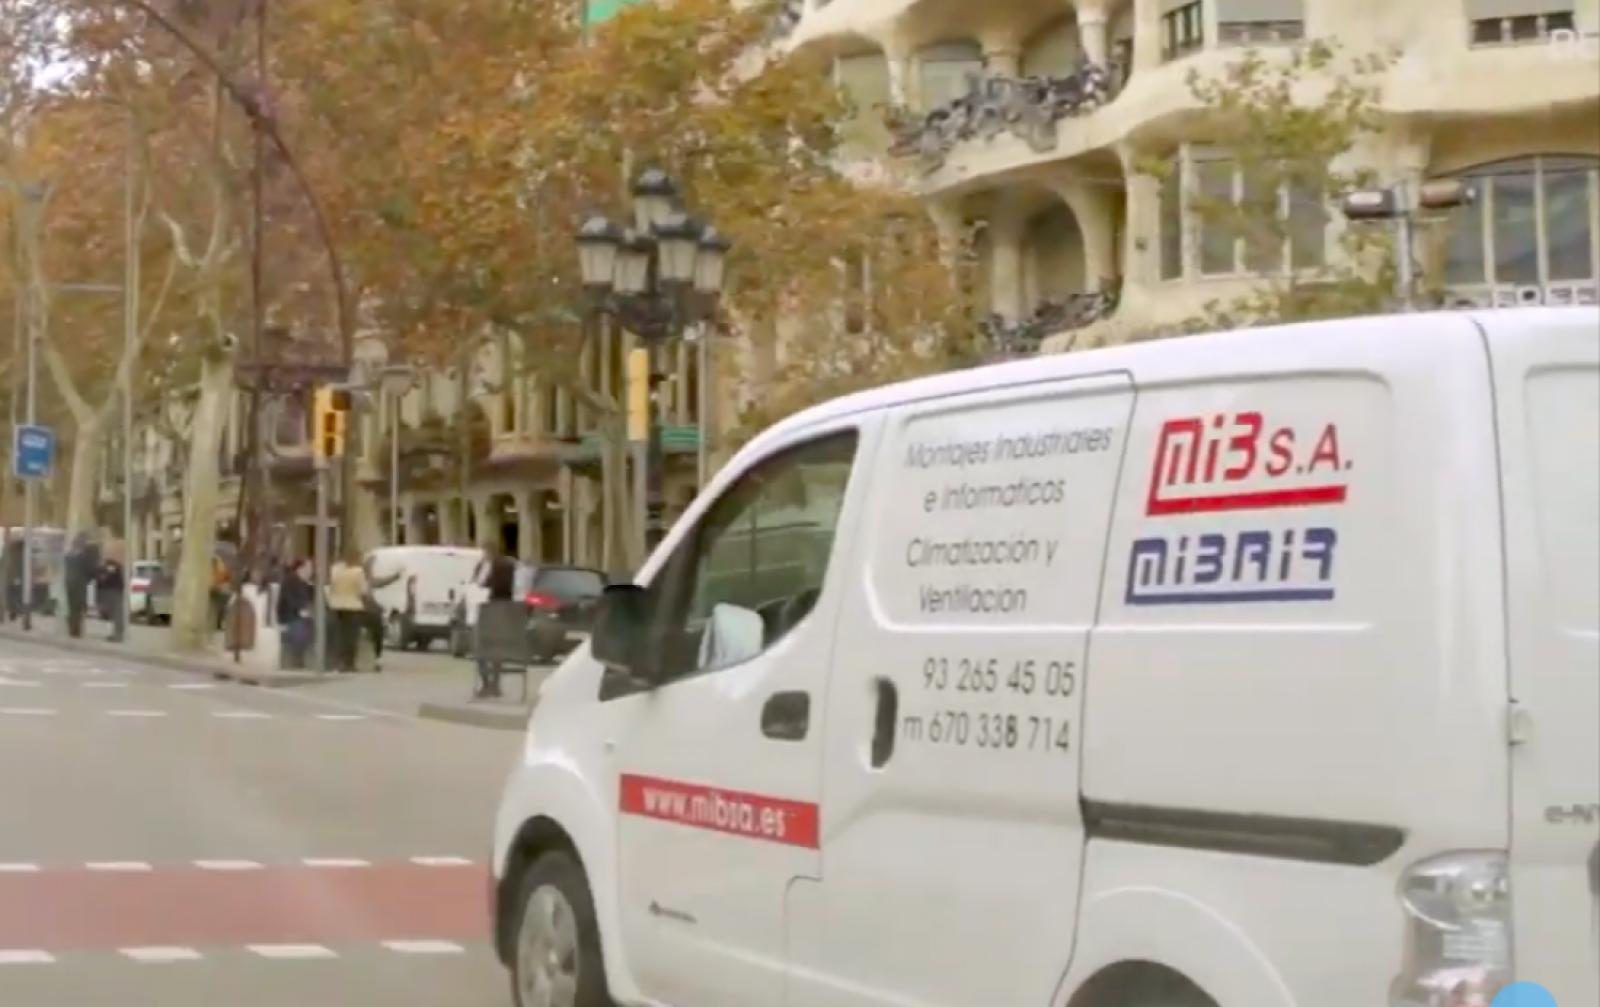 Nissan Elèctric a Mibsa